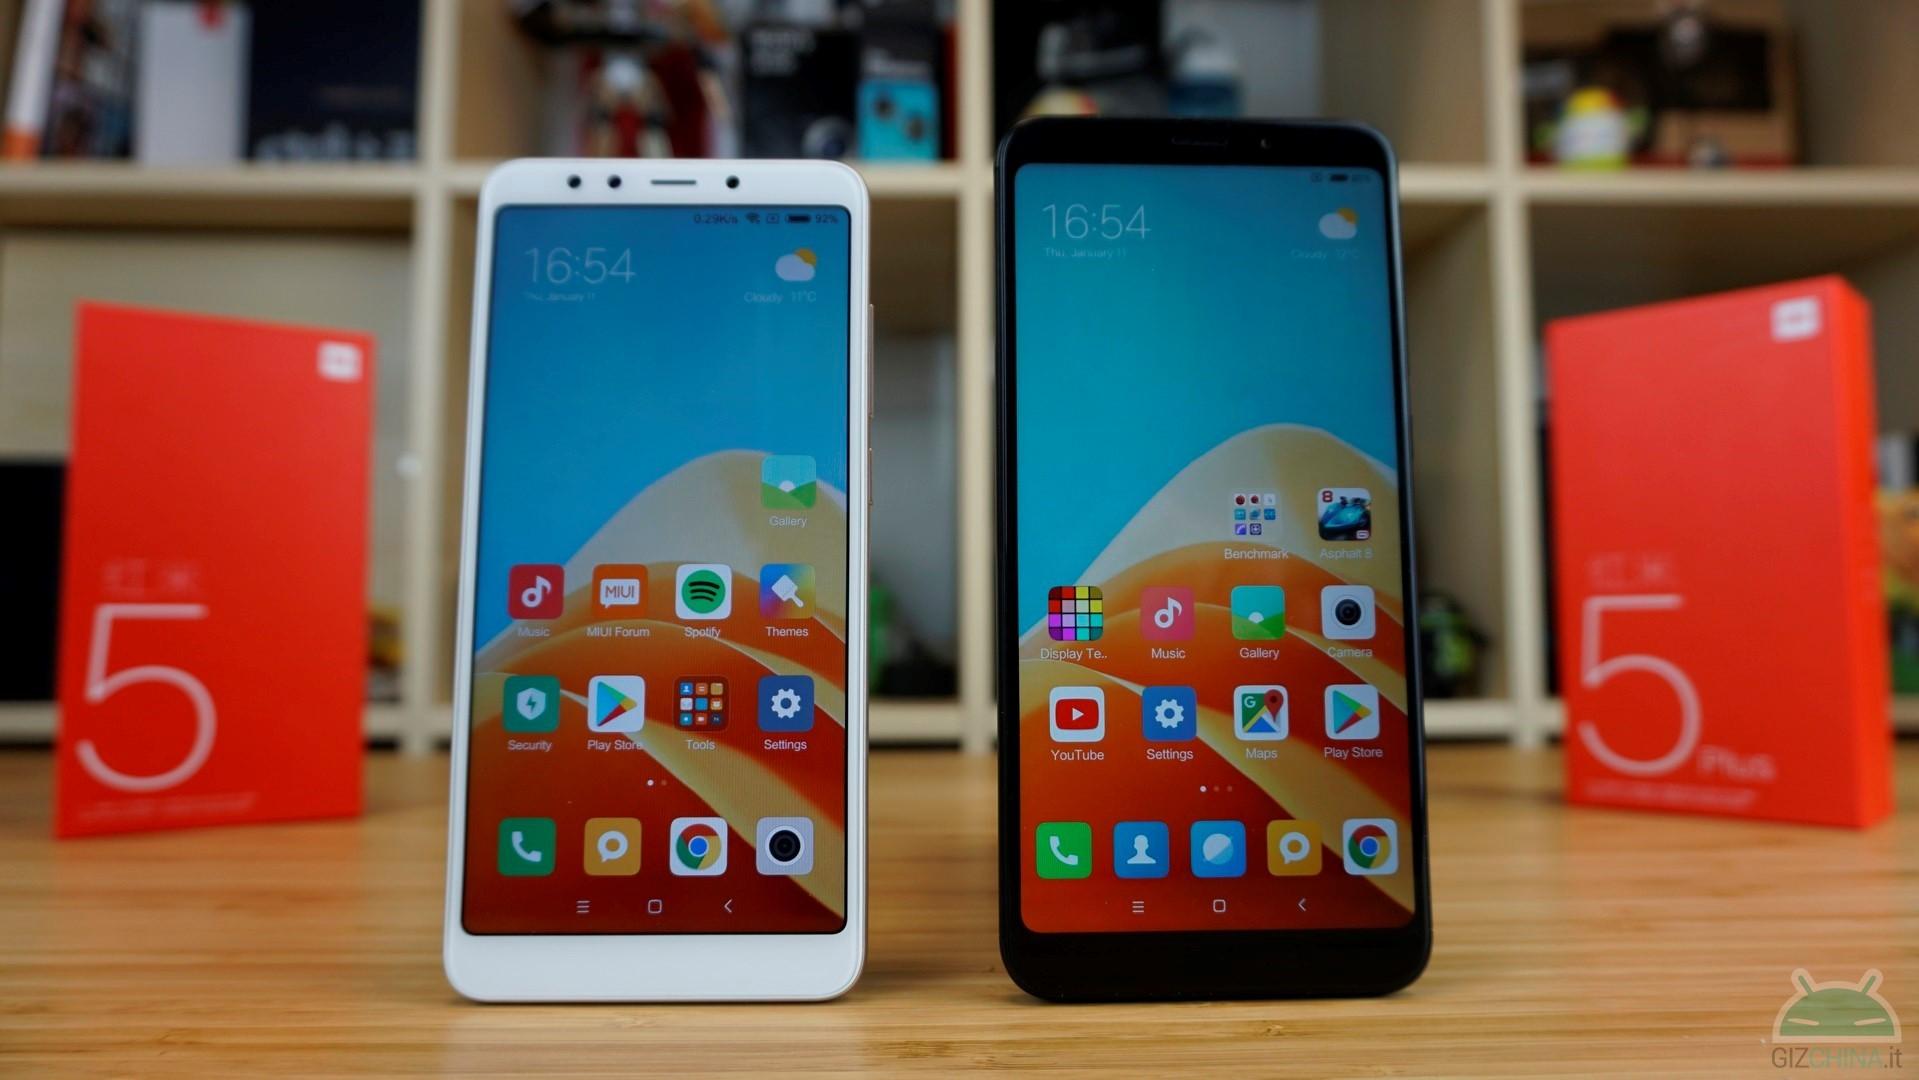 Xiaomi Redmi 5 Plus 4/64 GB Global - GearBest